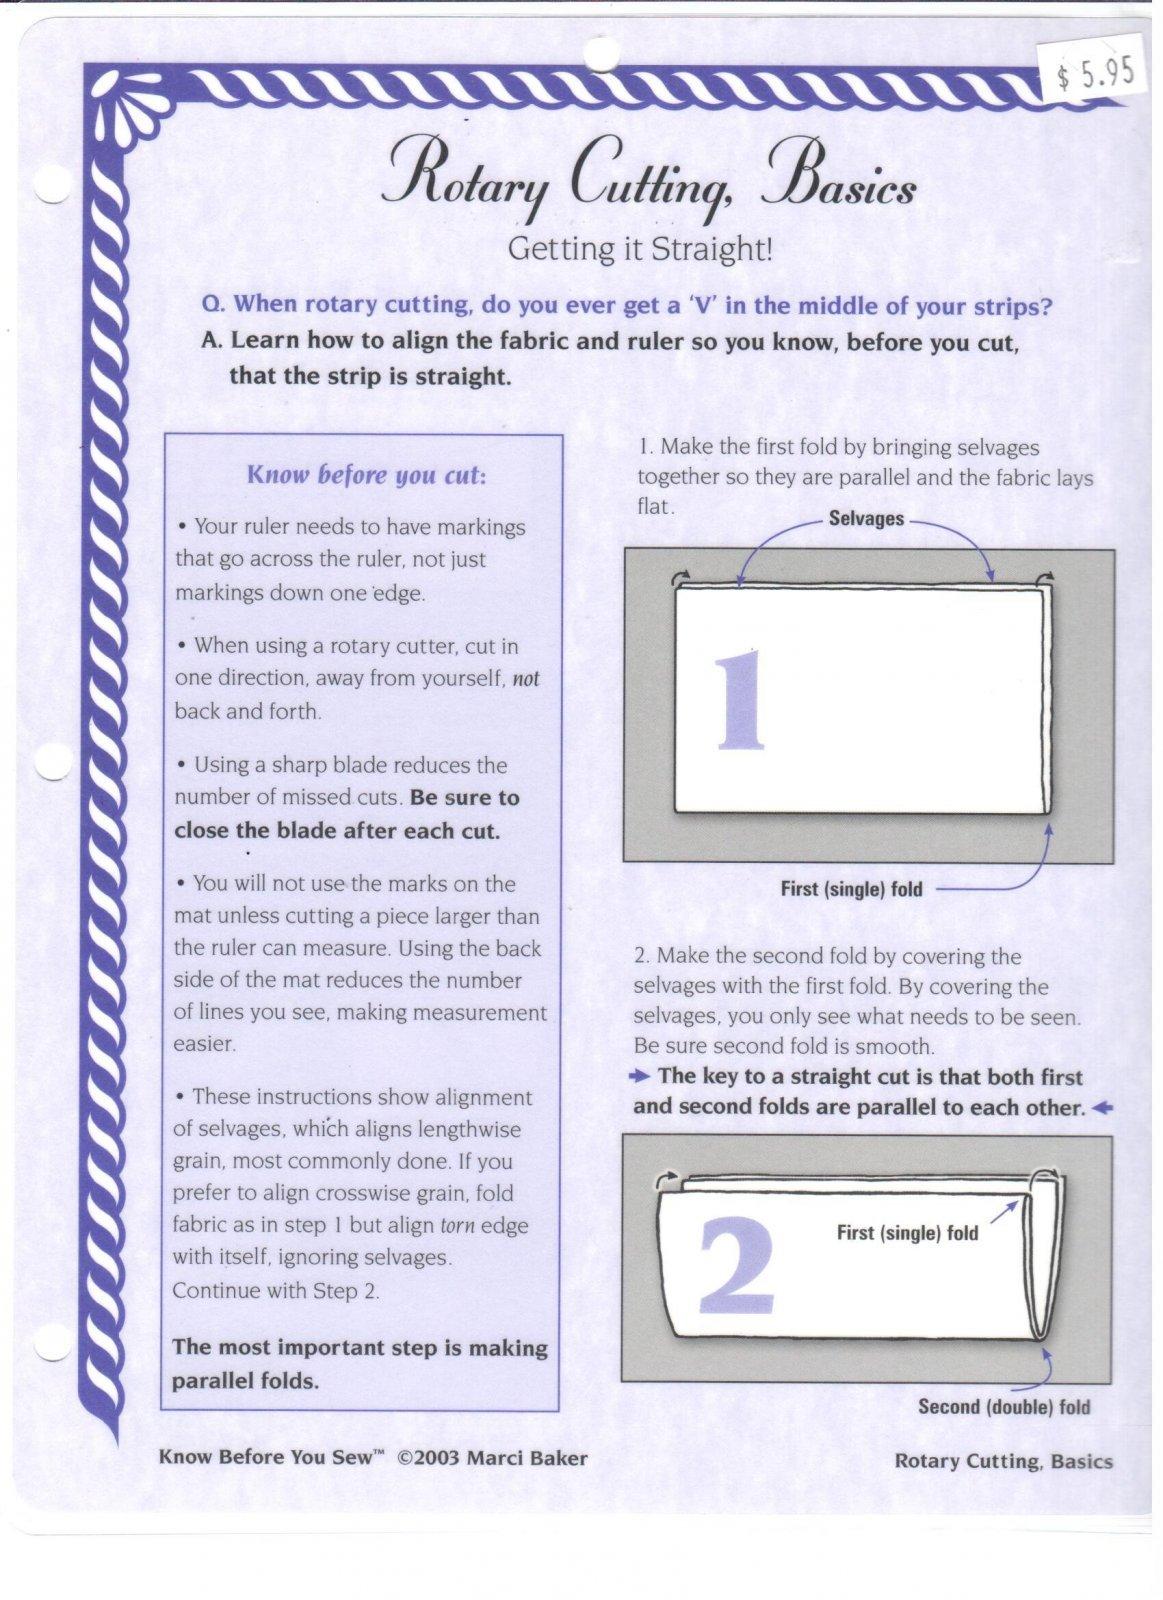 Rotary Cutting, Basics